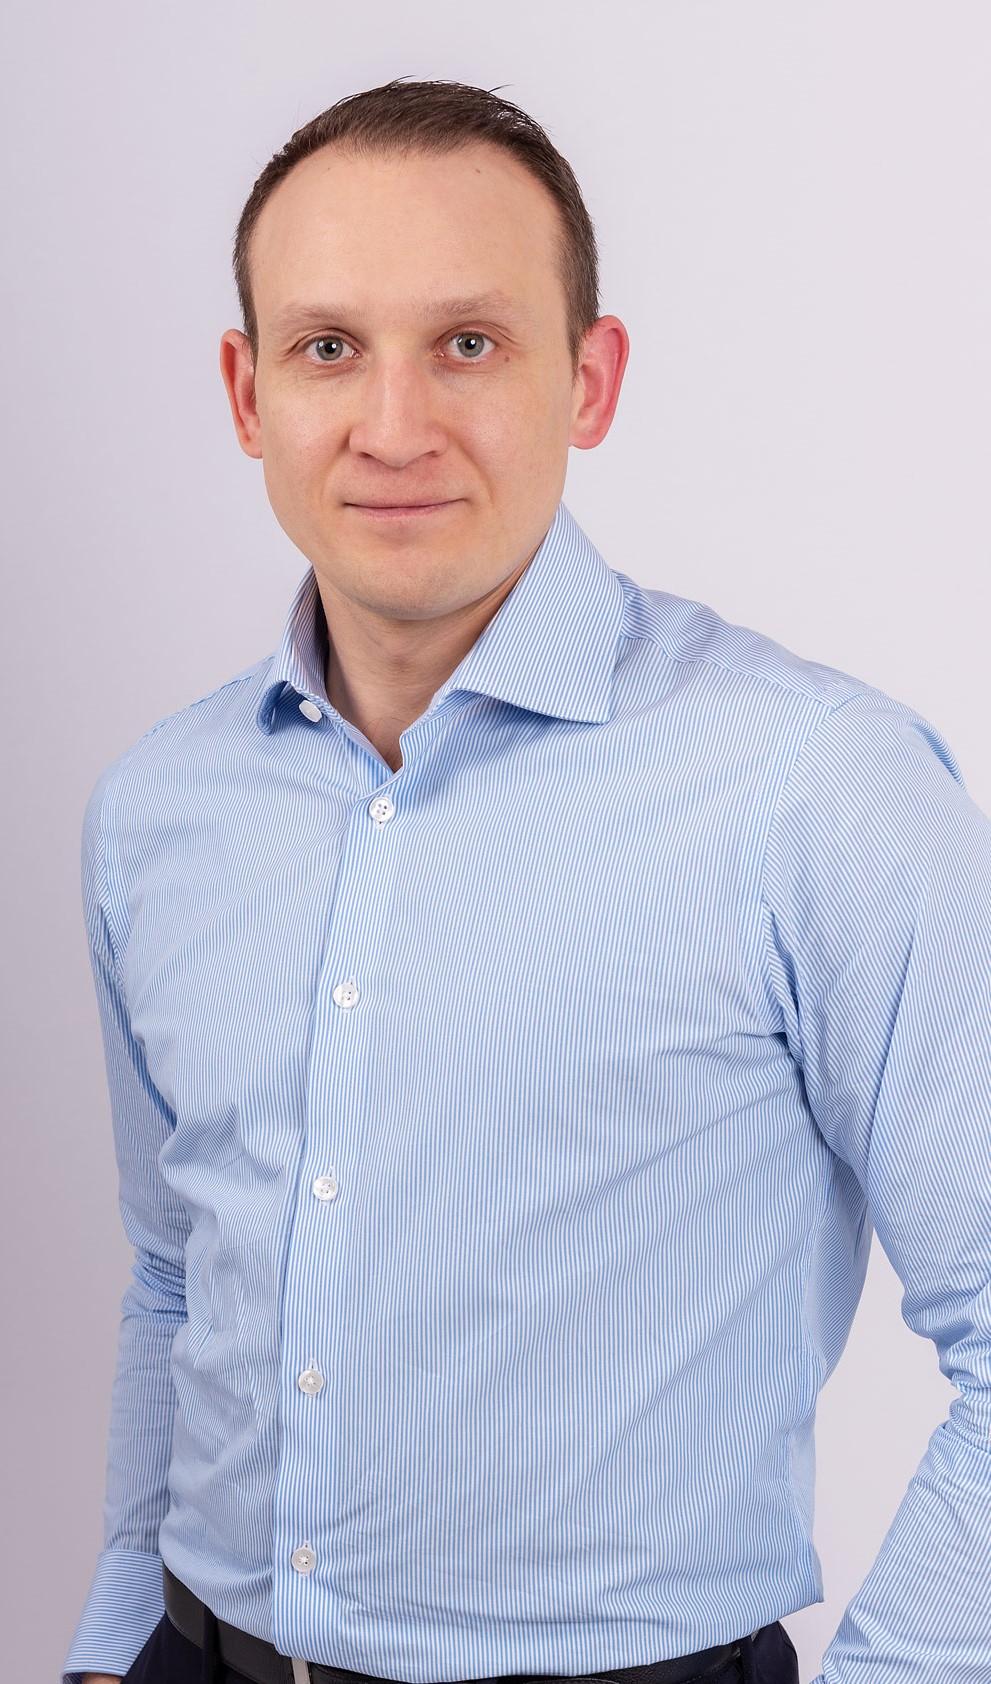 David Iusow